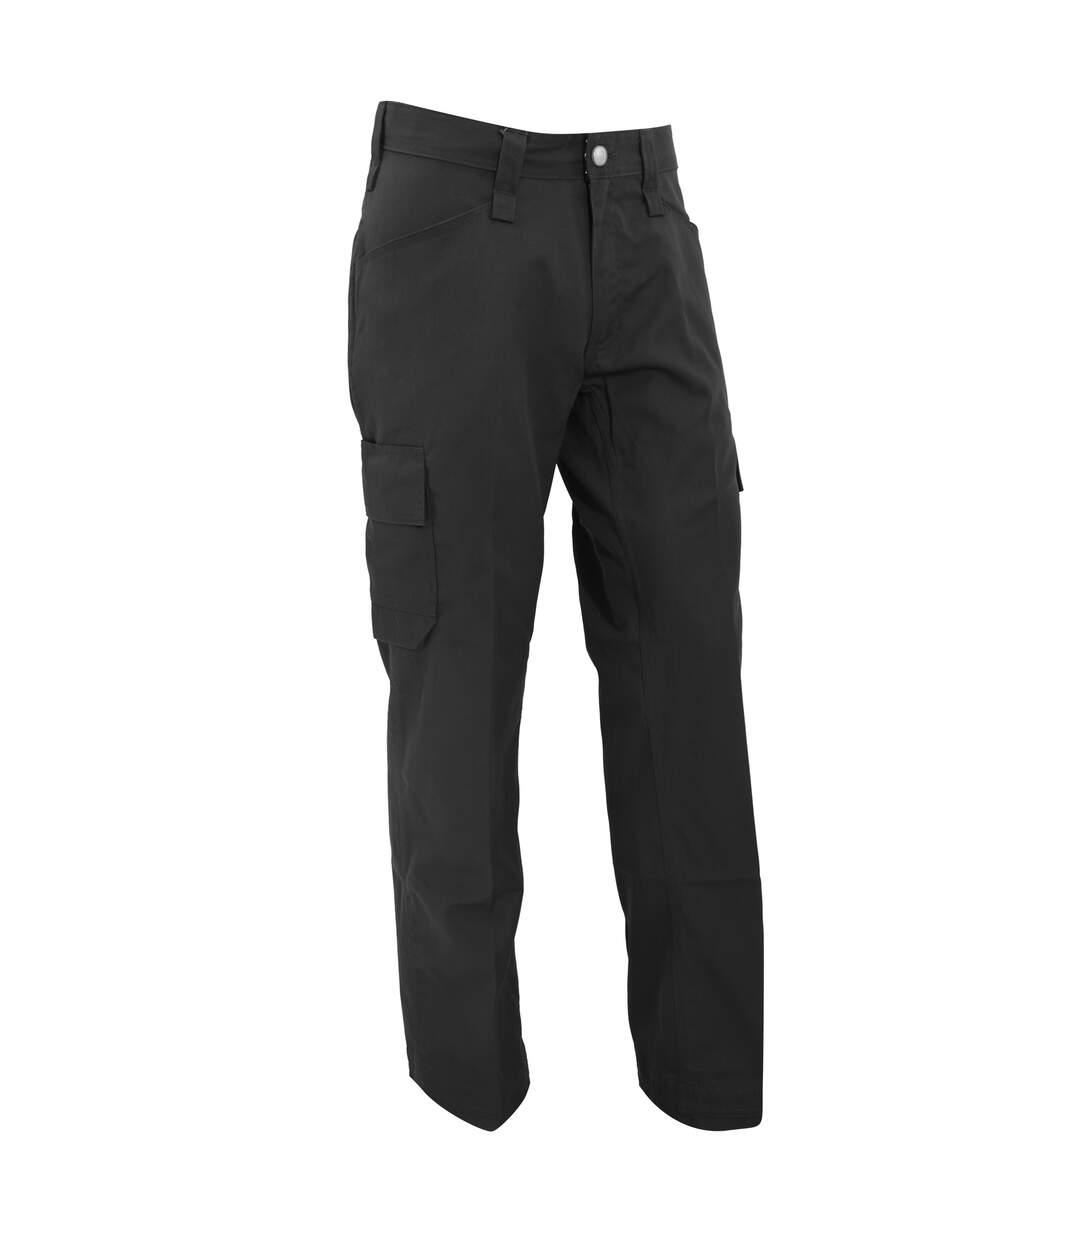 Helly Hansen Durham - Pantalon De Travail - Homme (Noir) - UTBC1434